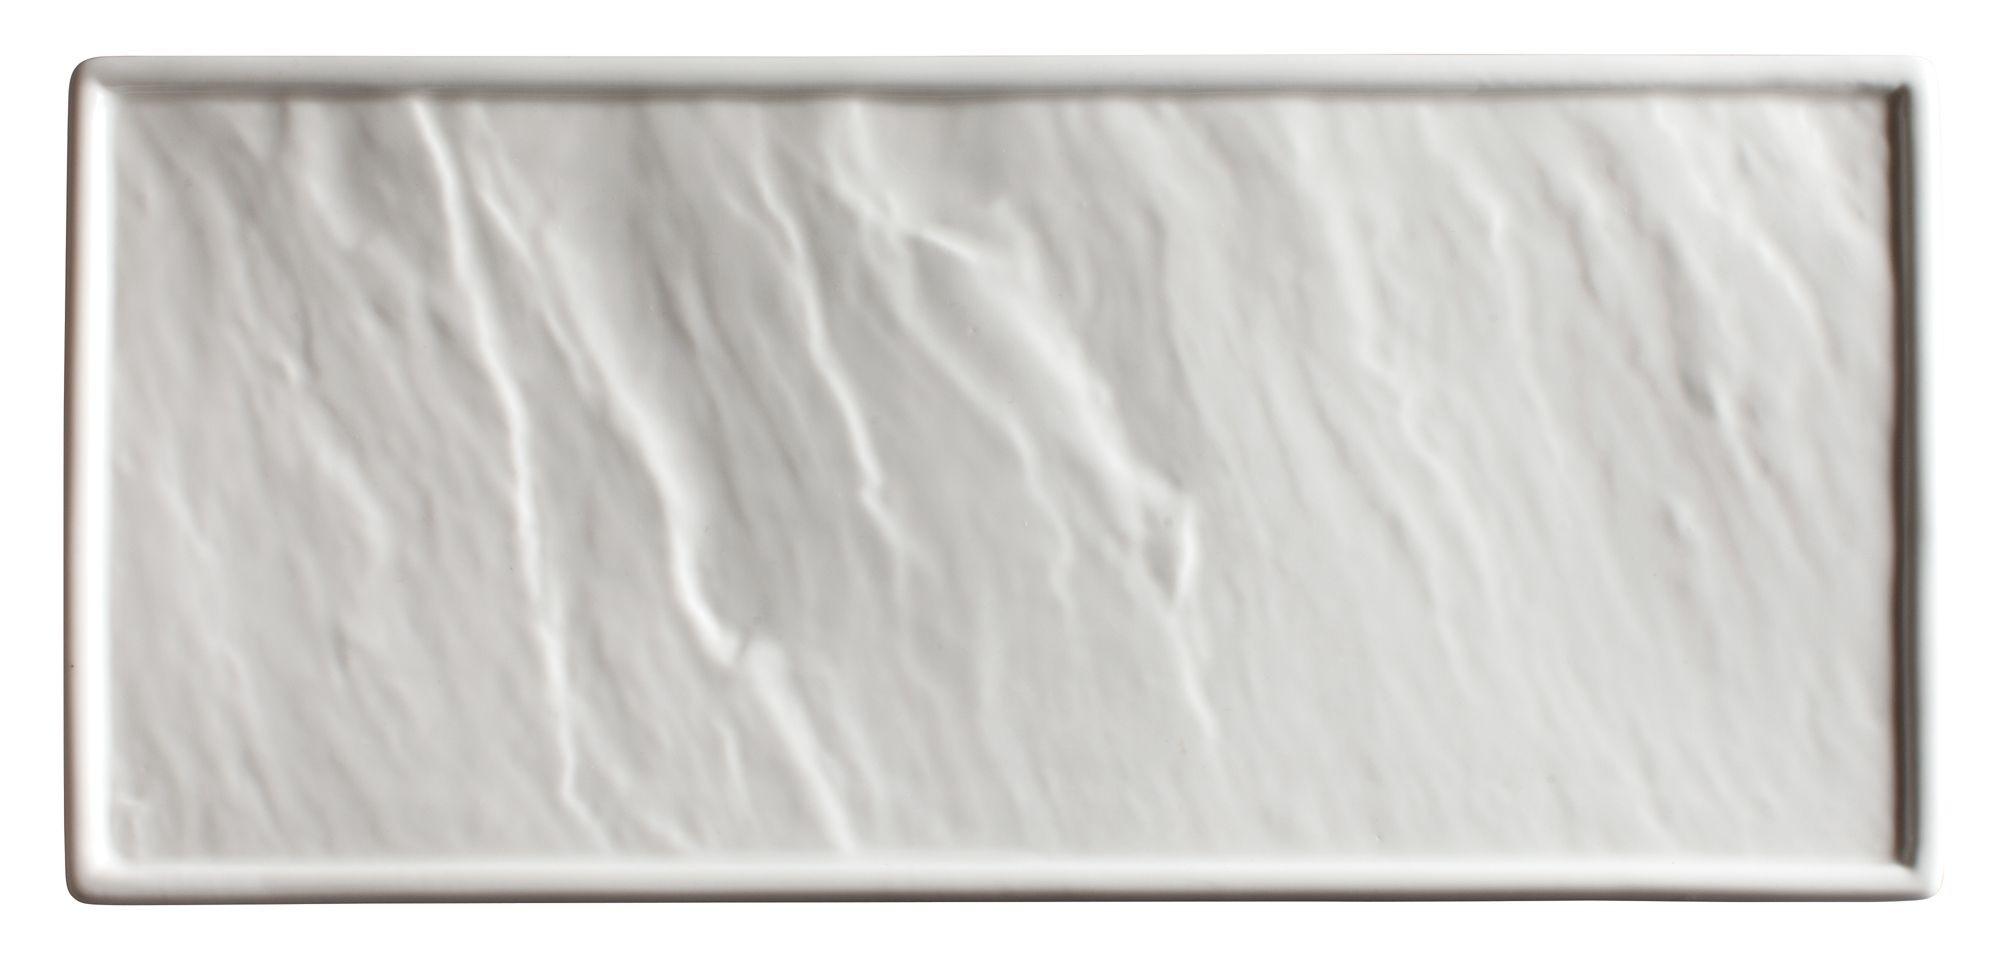 "Winco WDP001-204 Calacatta Creamy White Porcelain Rectangular Platter 16-1/8"" x 6-7/8"""